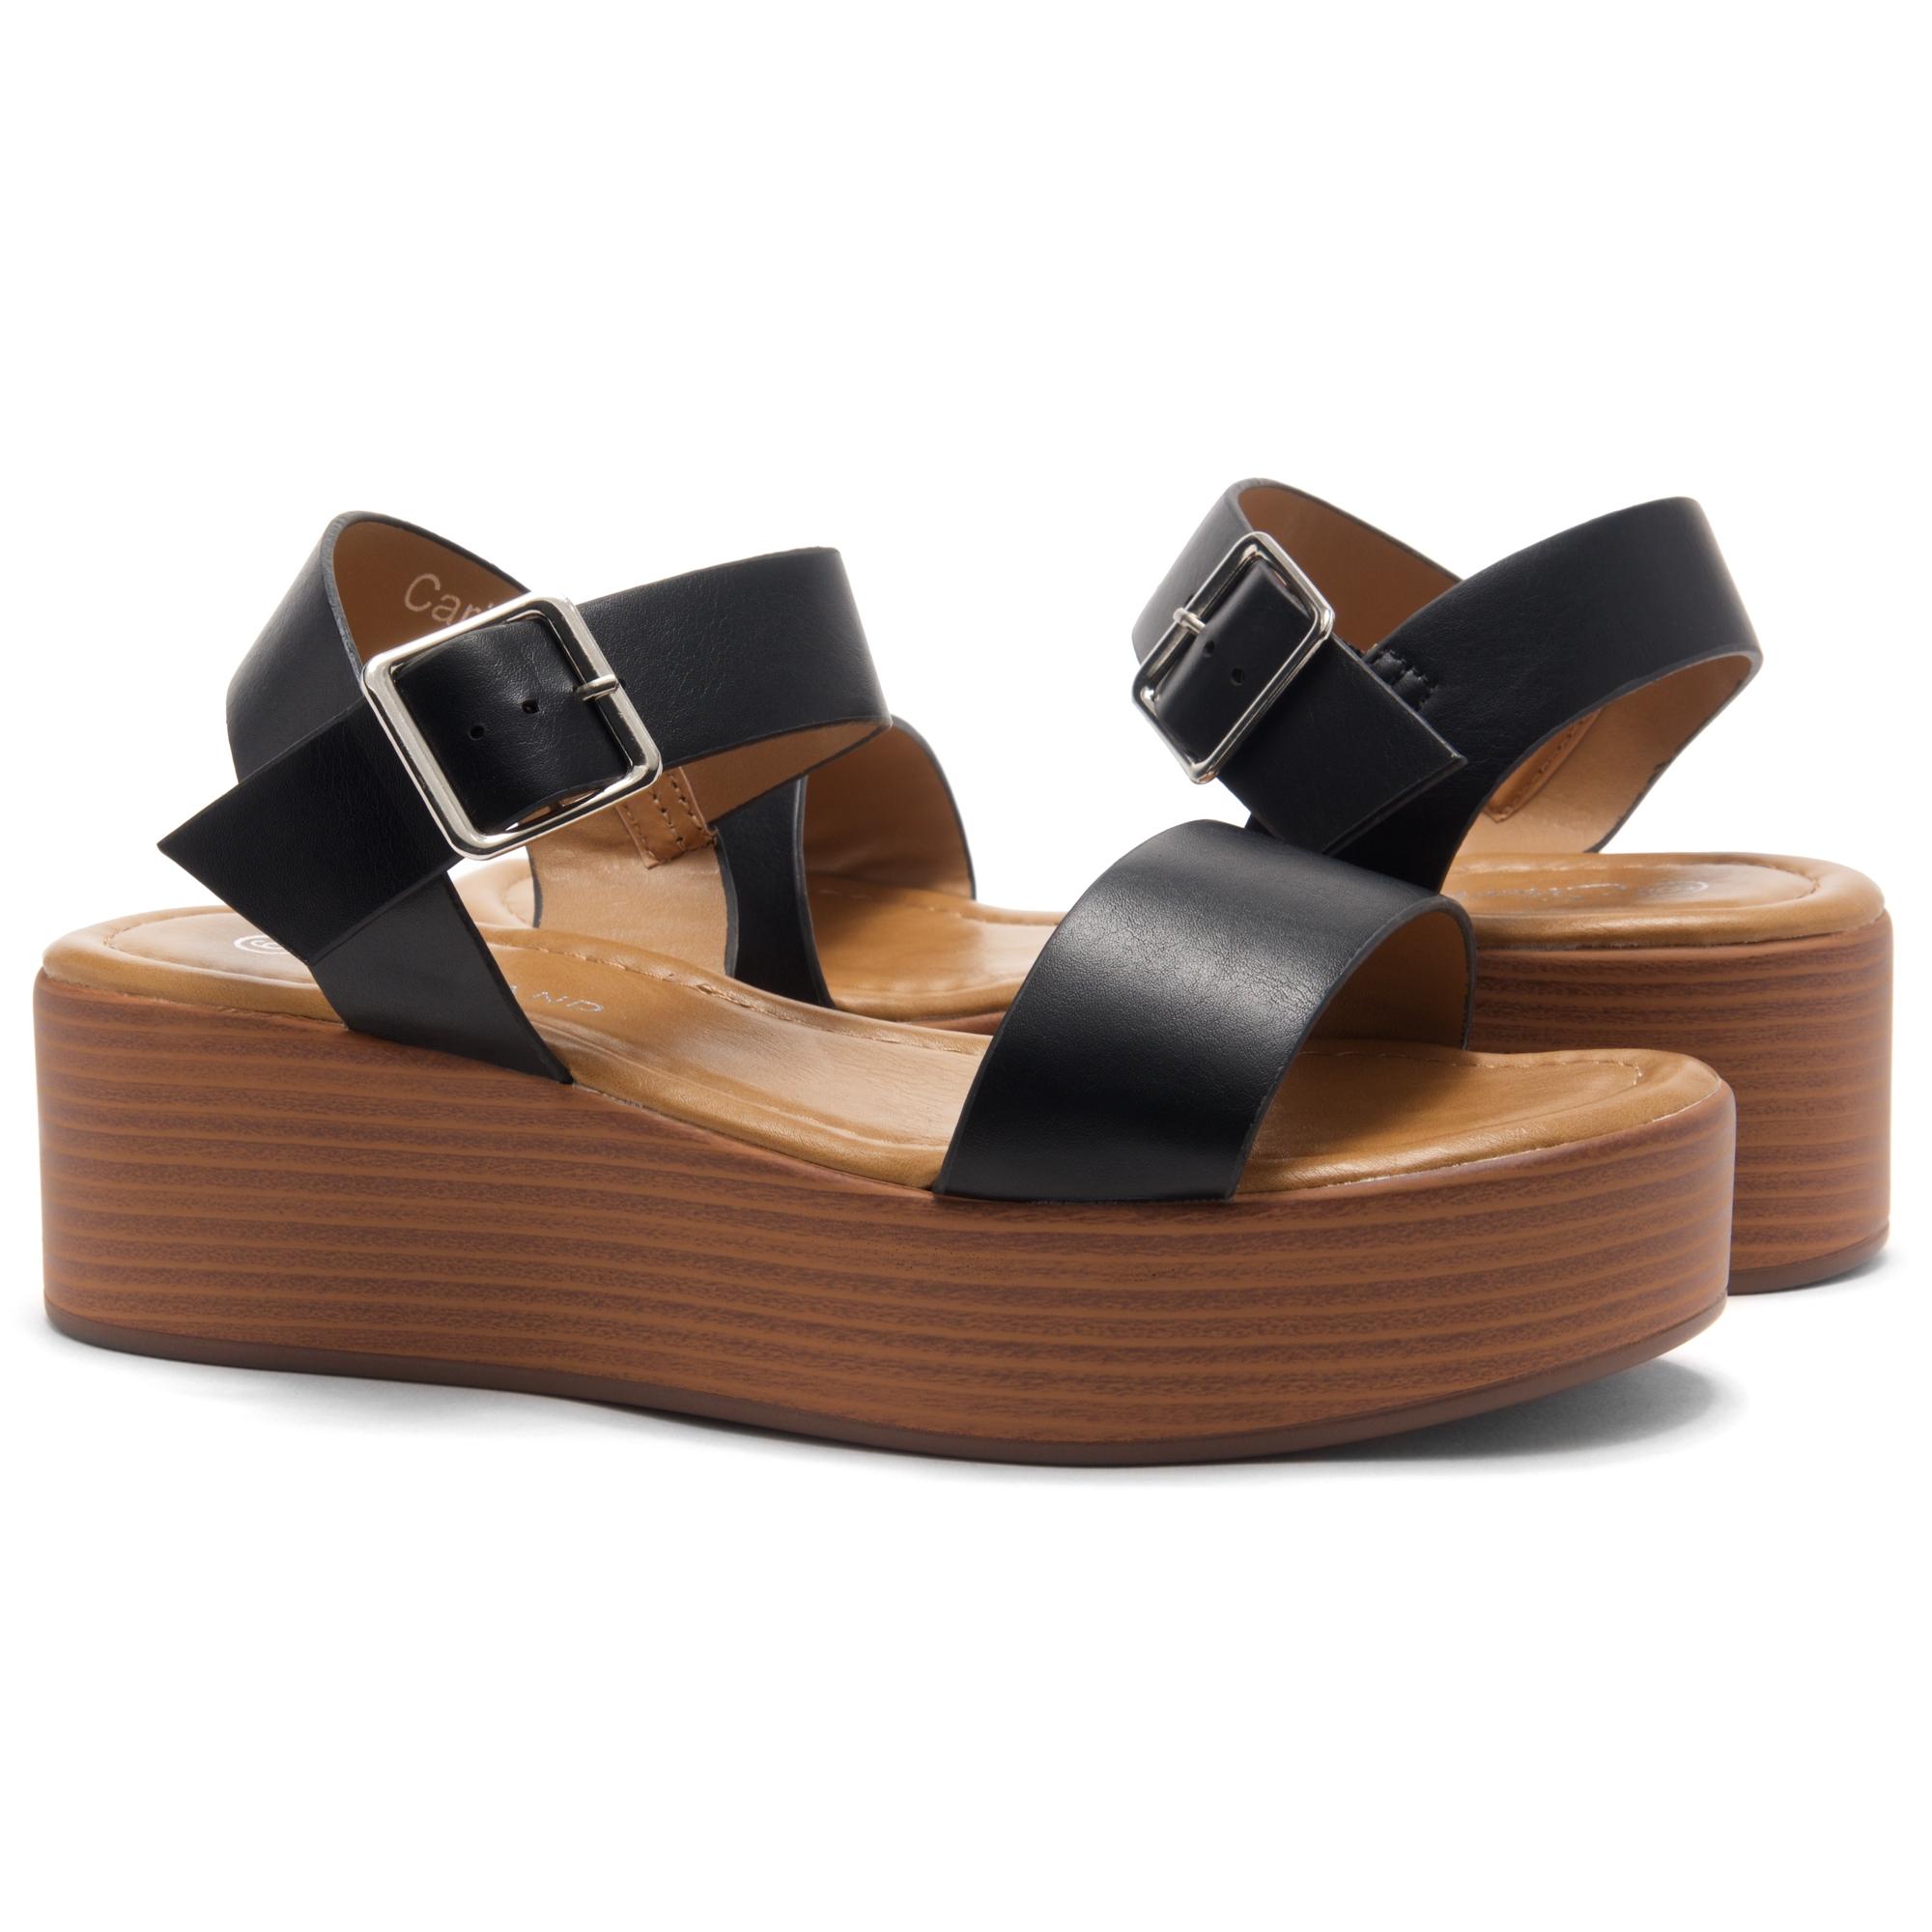 Open Carita Wedgeblackwood Herstyle Toe Strap Platform Ankle by76Yvfg